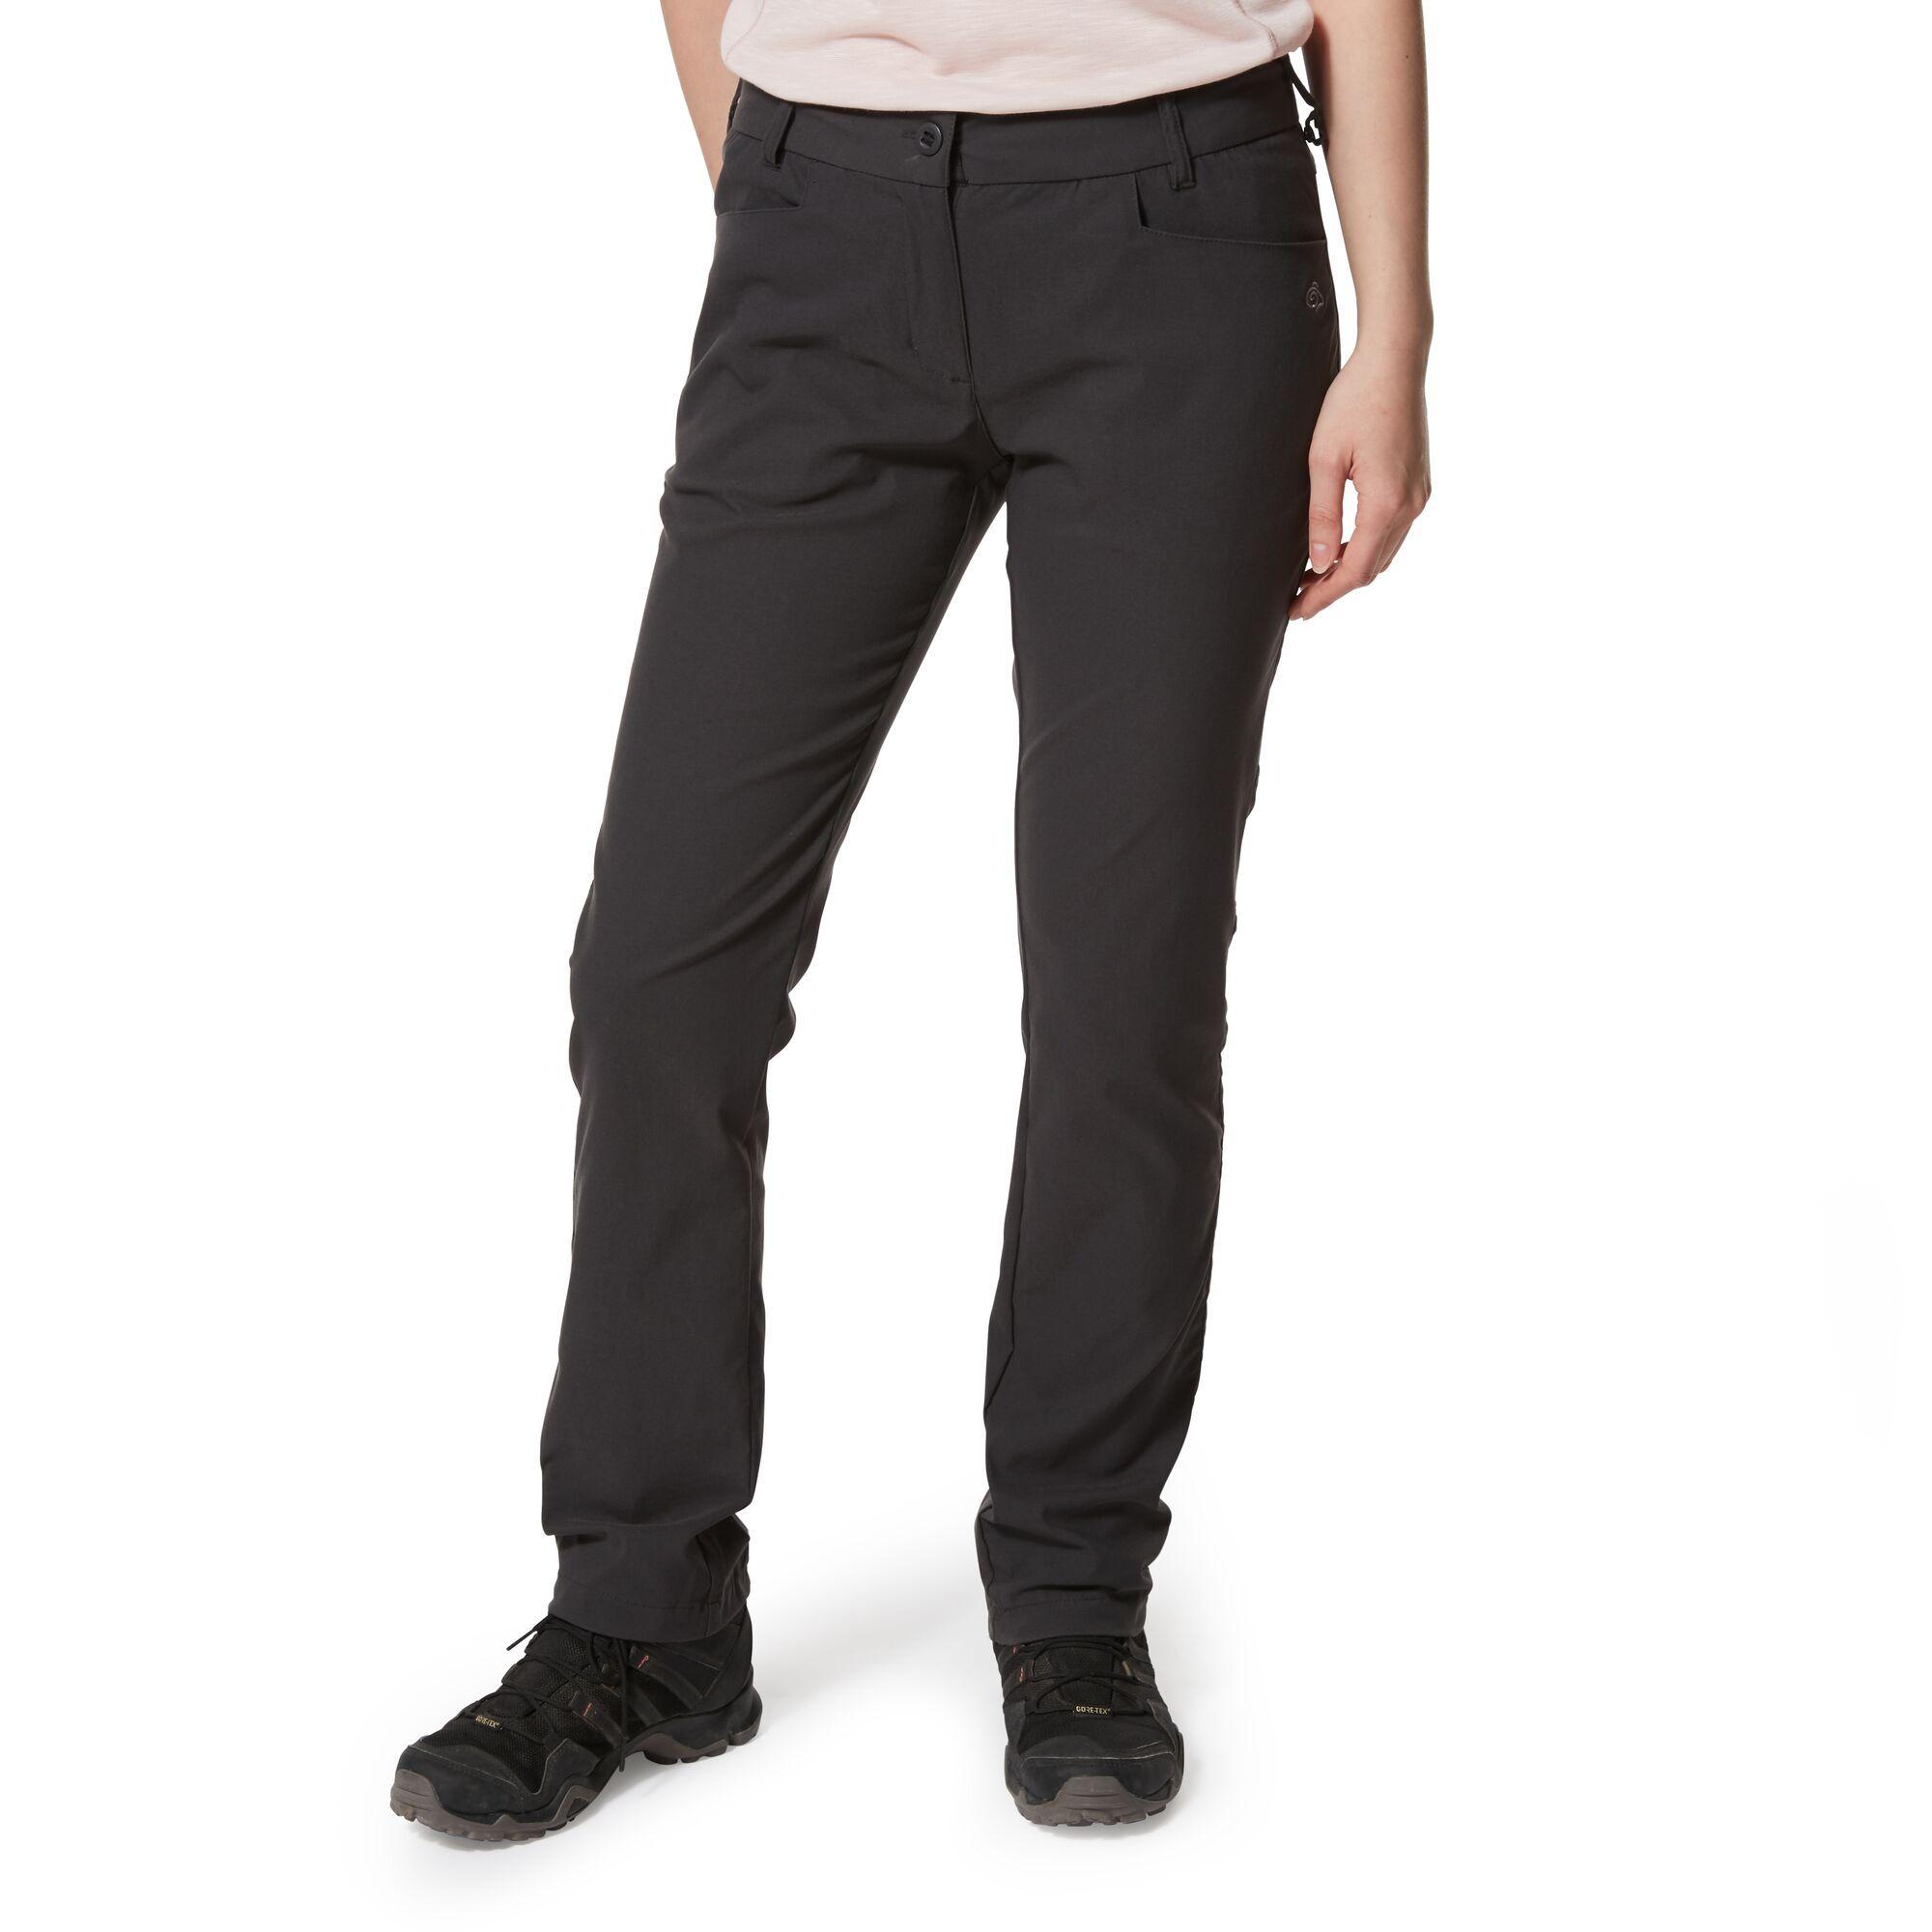 Craghoppers-Pantalon-CLARA-Femme-CG1066 miniature 15